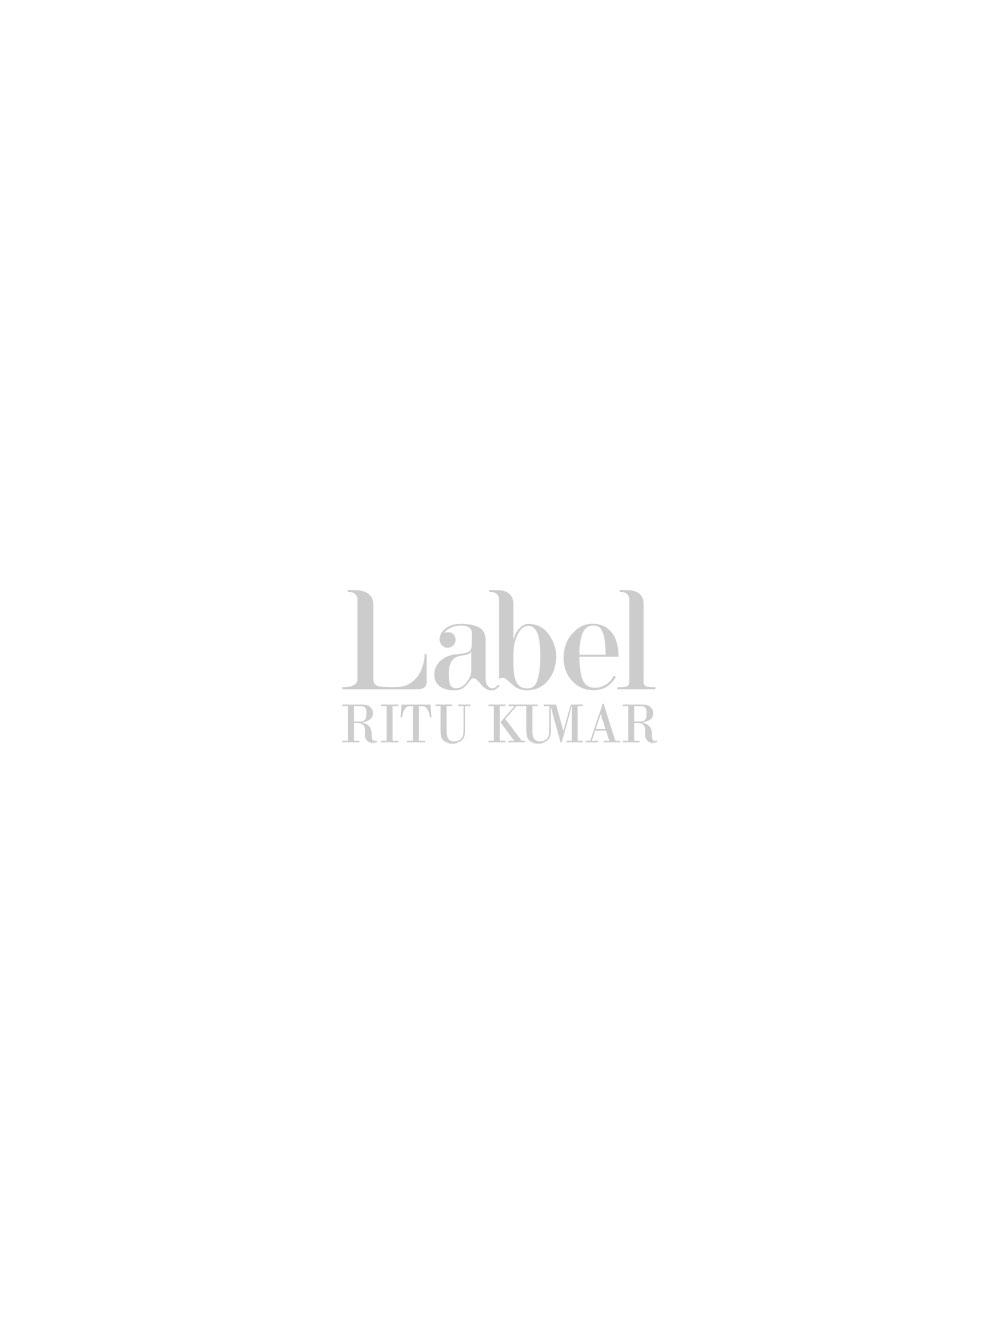 The new way to look Bohemian by Label Ritu Kumar